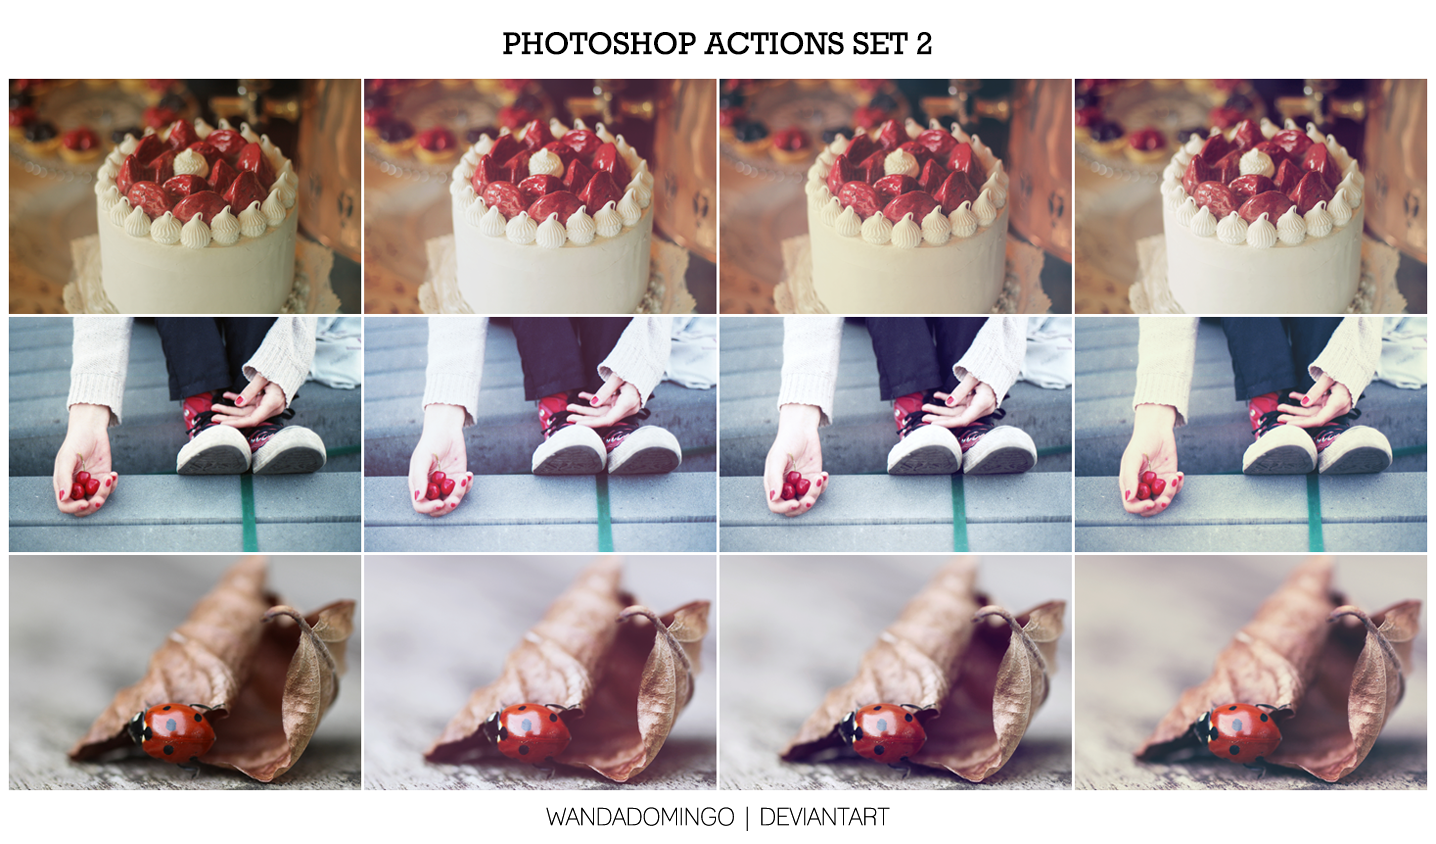 Photoshop Actions Set 2